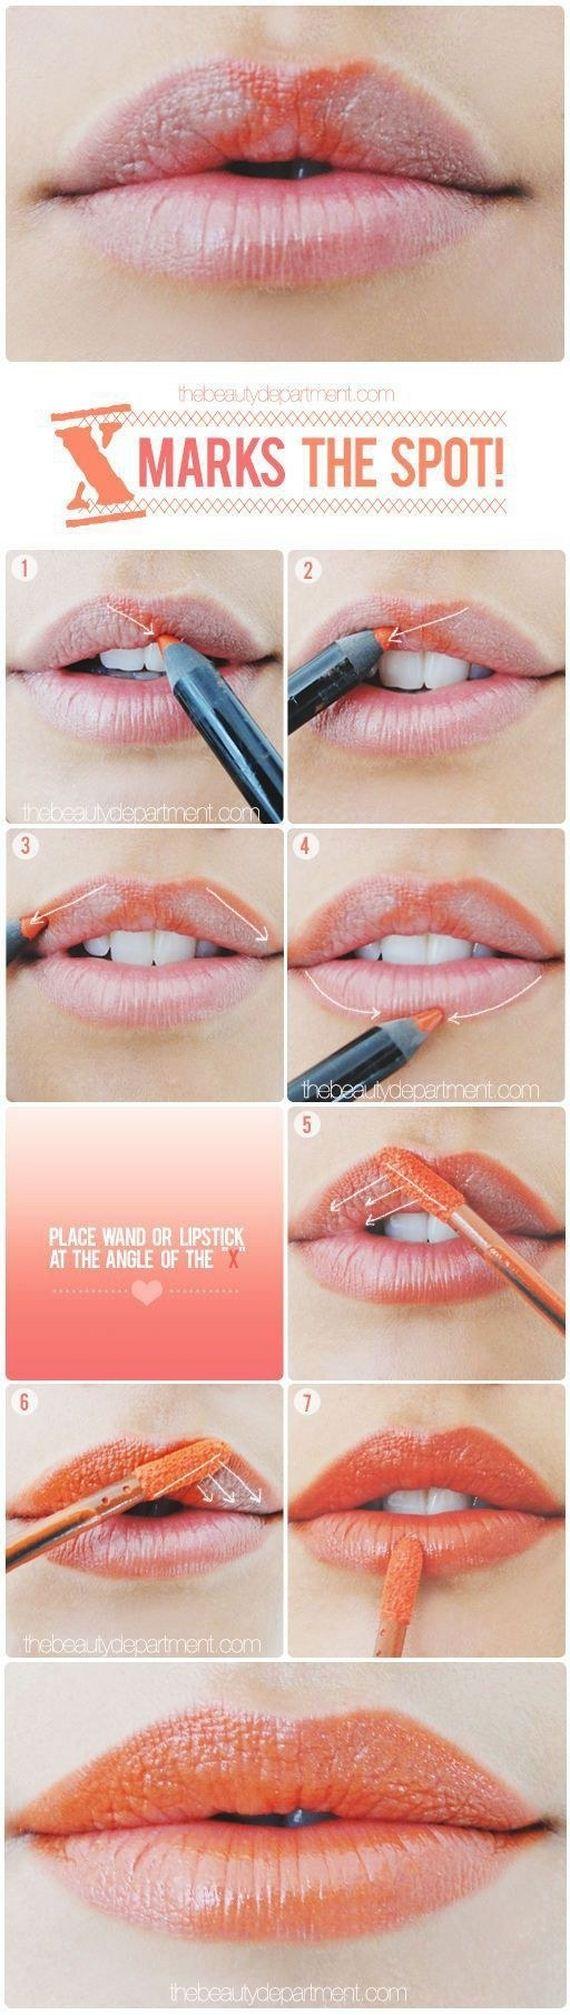 14-your-lipstick